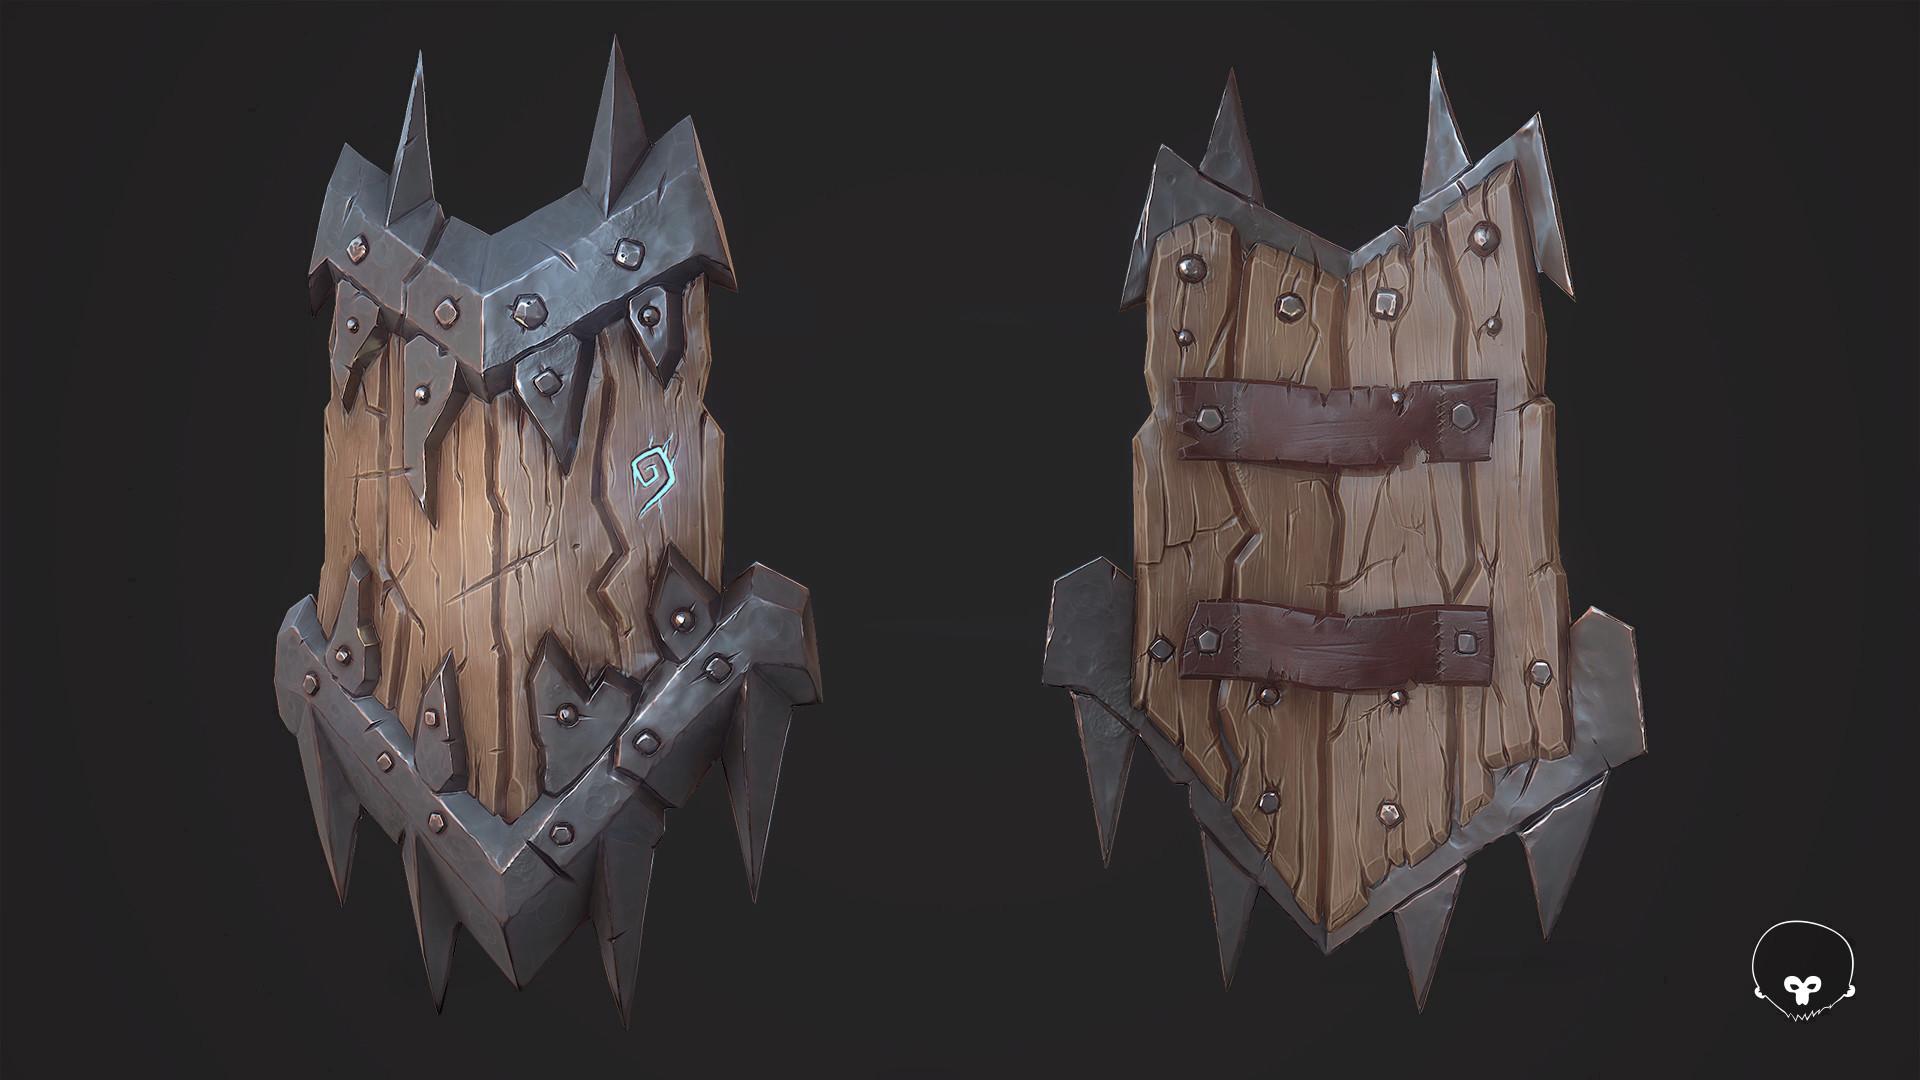 ArtStation - Orc Shield, Martin Mariezcurrena Alcasena